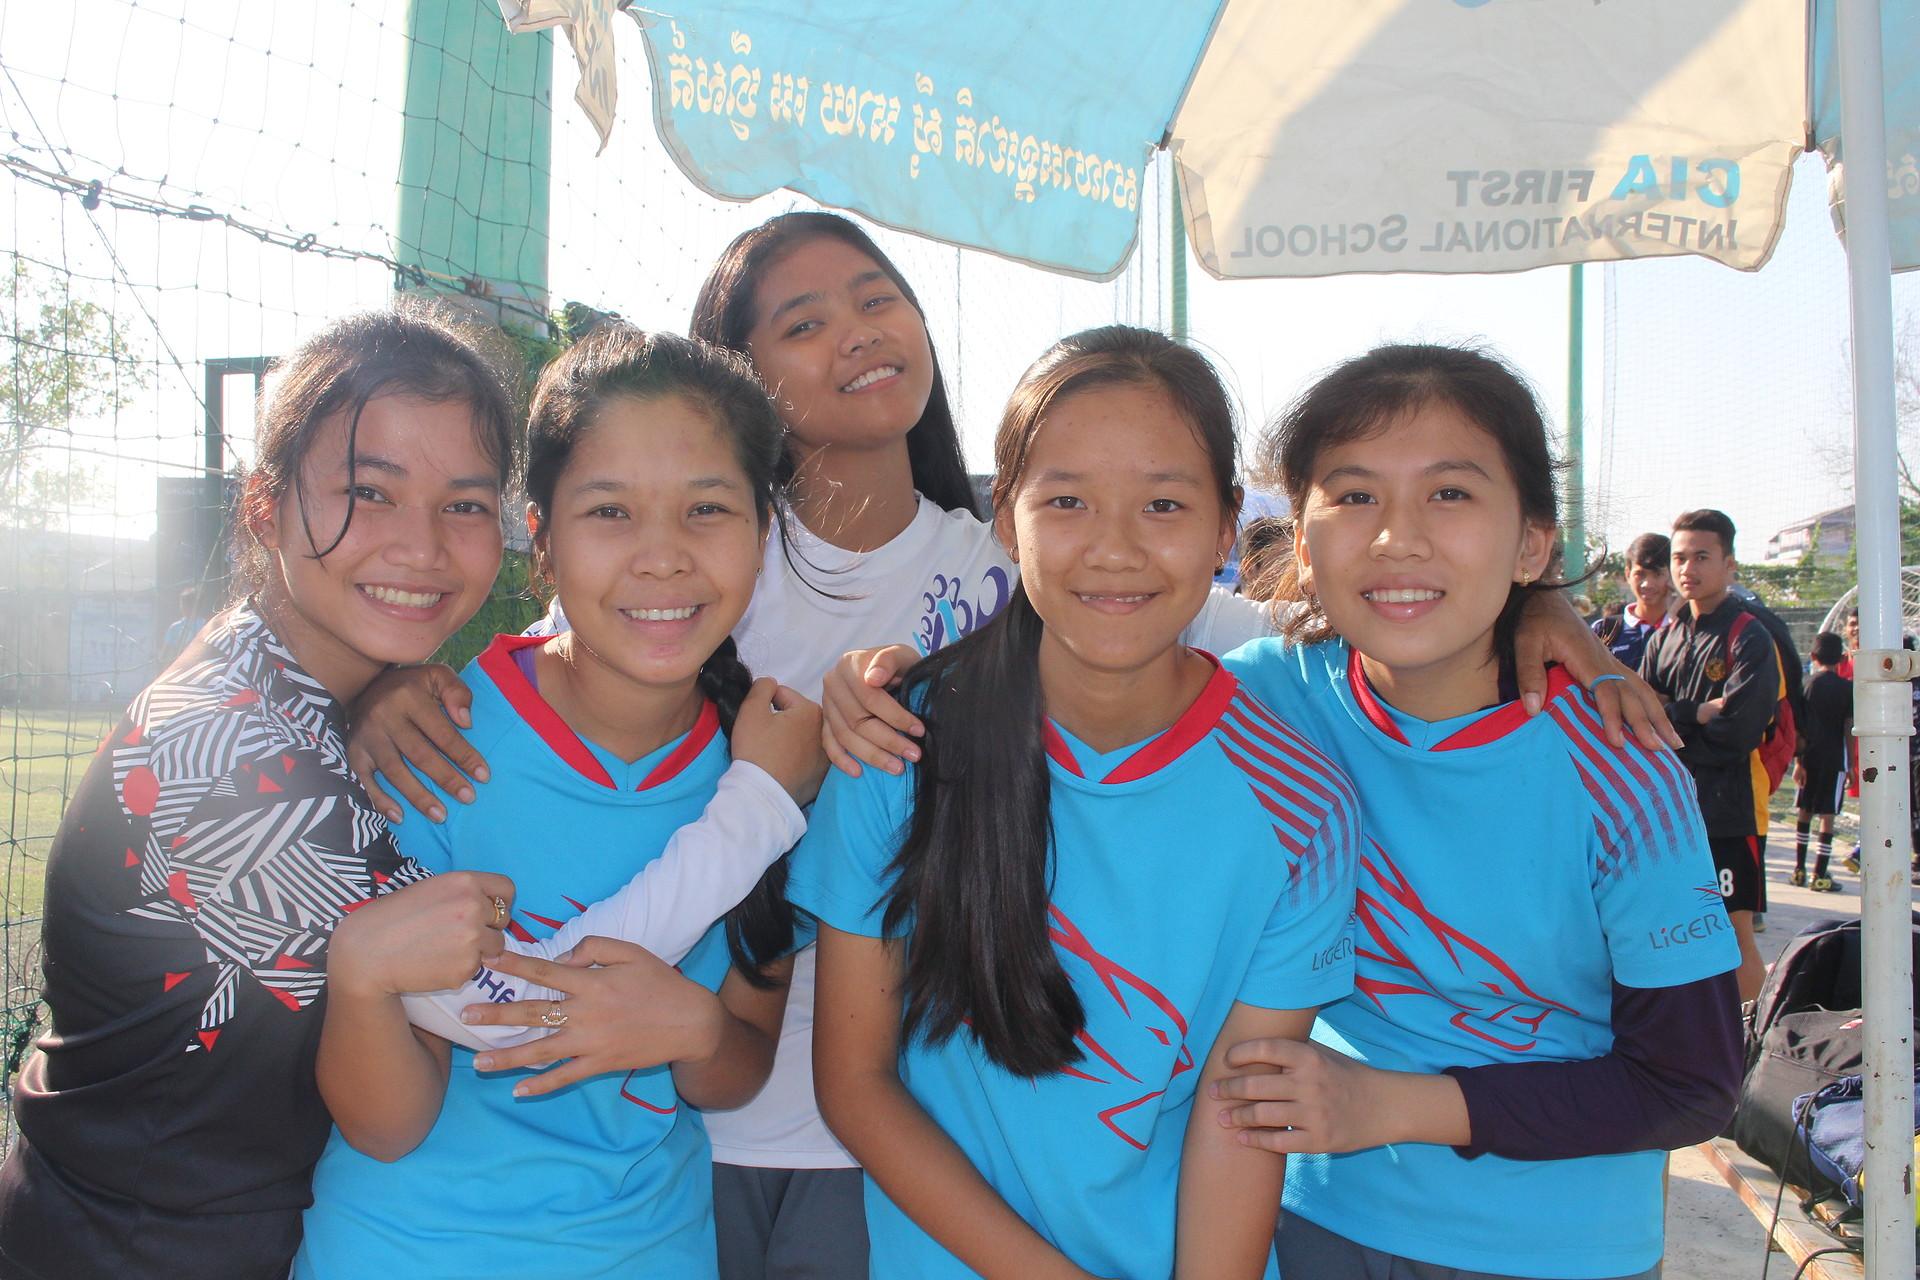 My Teammates